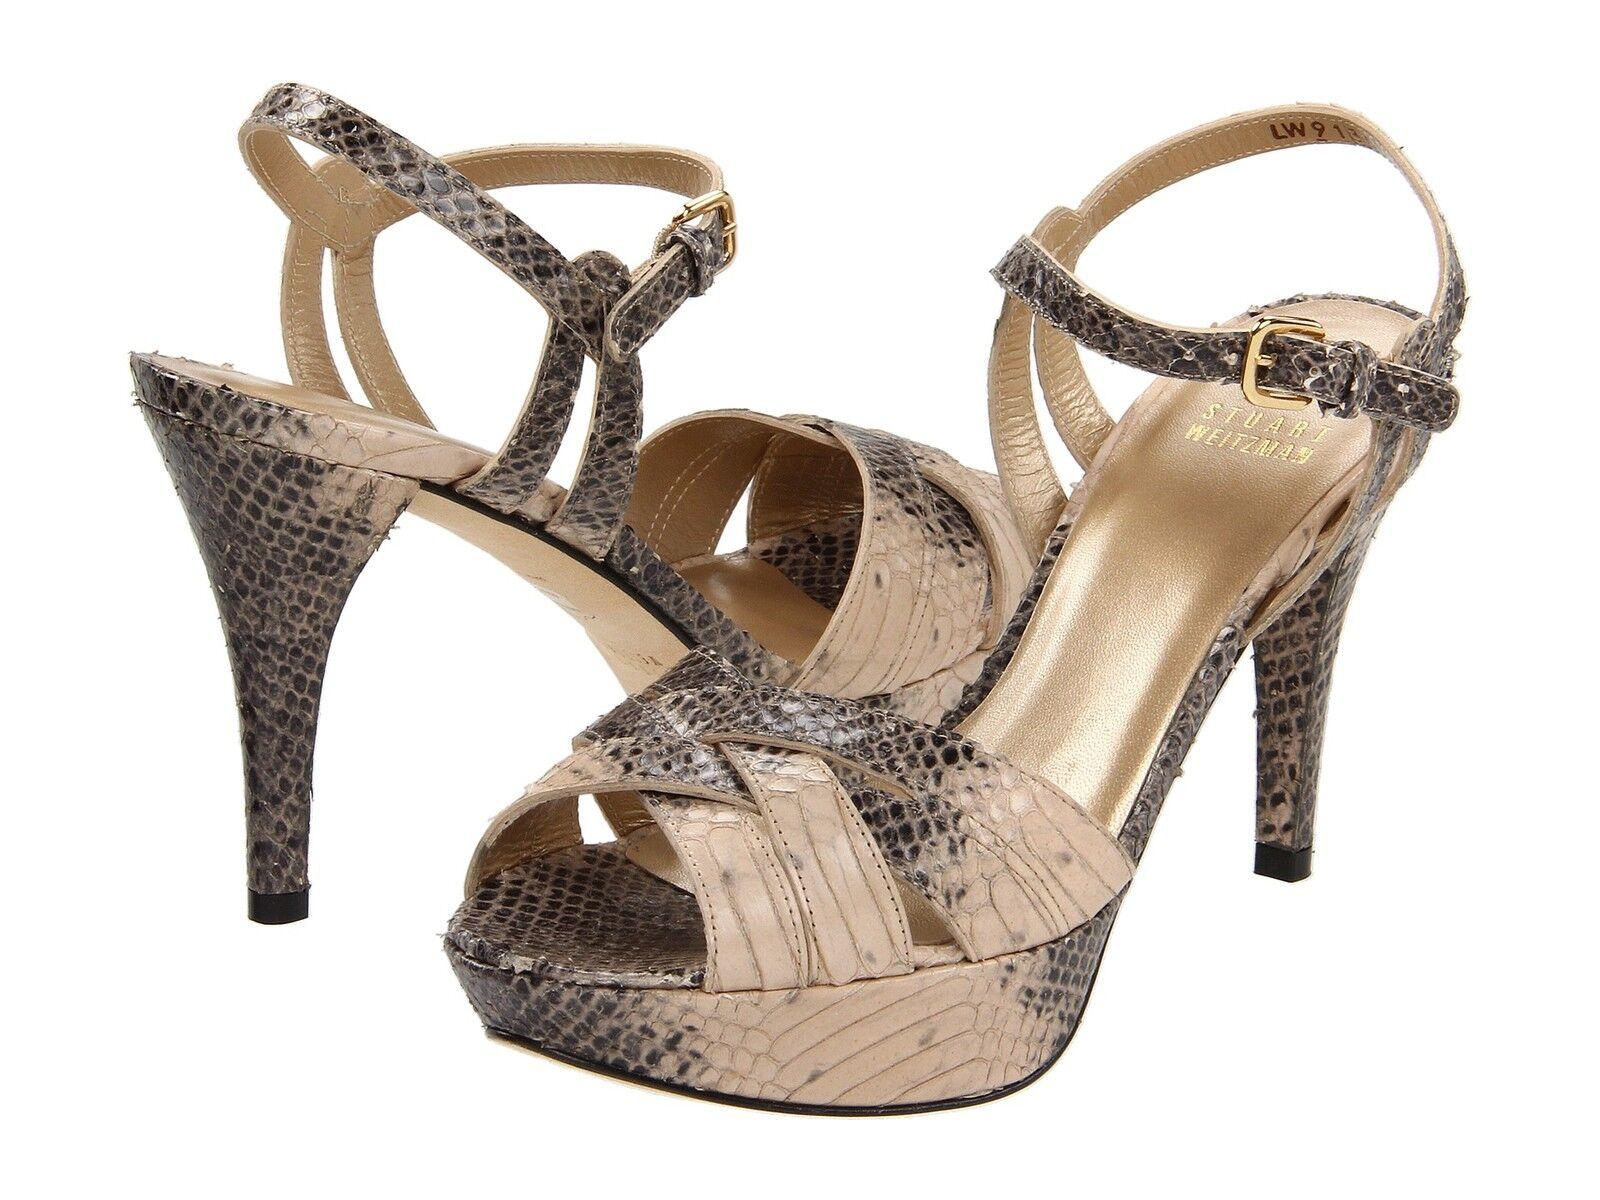 395 Stuart Weitzman Loopthru Peep Toe Pumps Platform Sandale Schuhes 9 Slingback